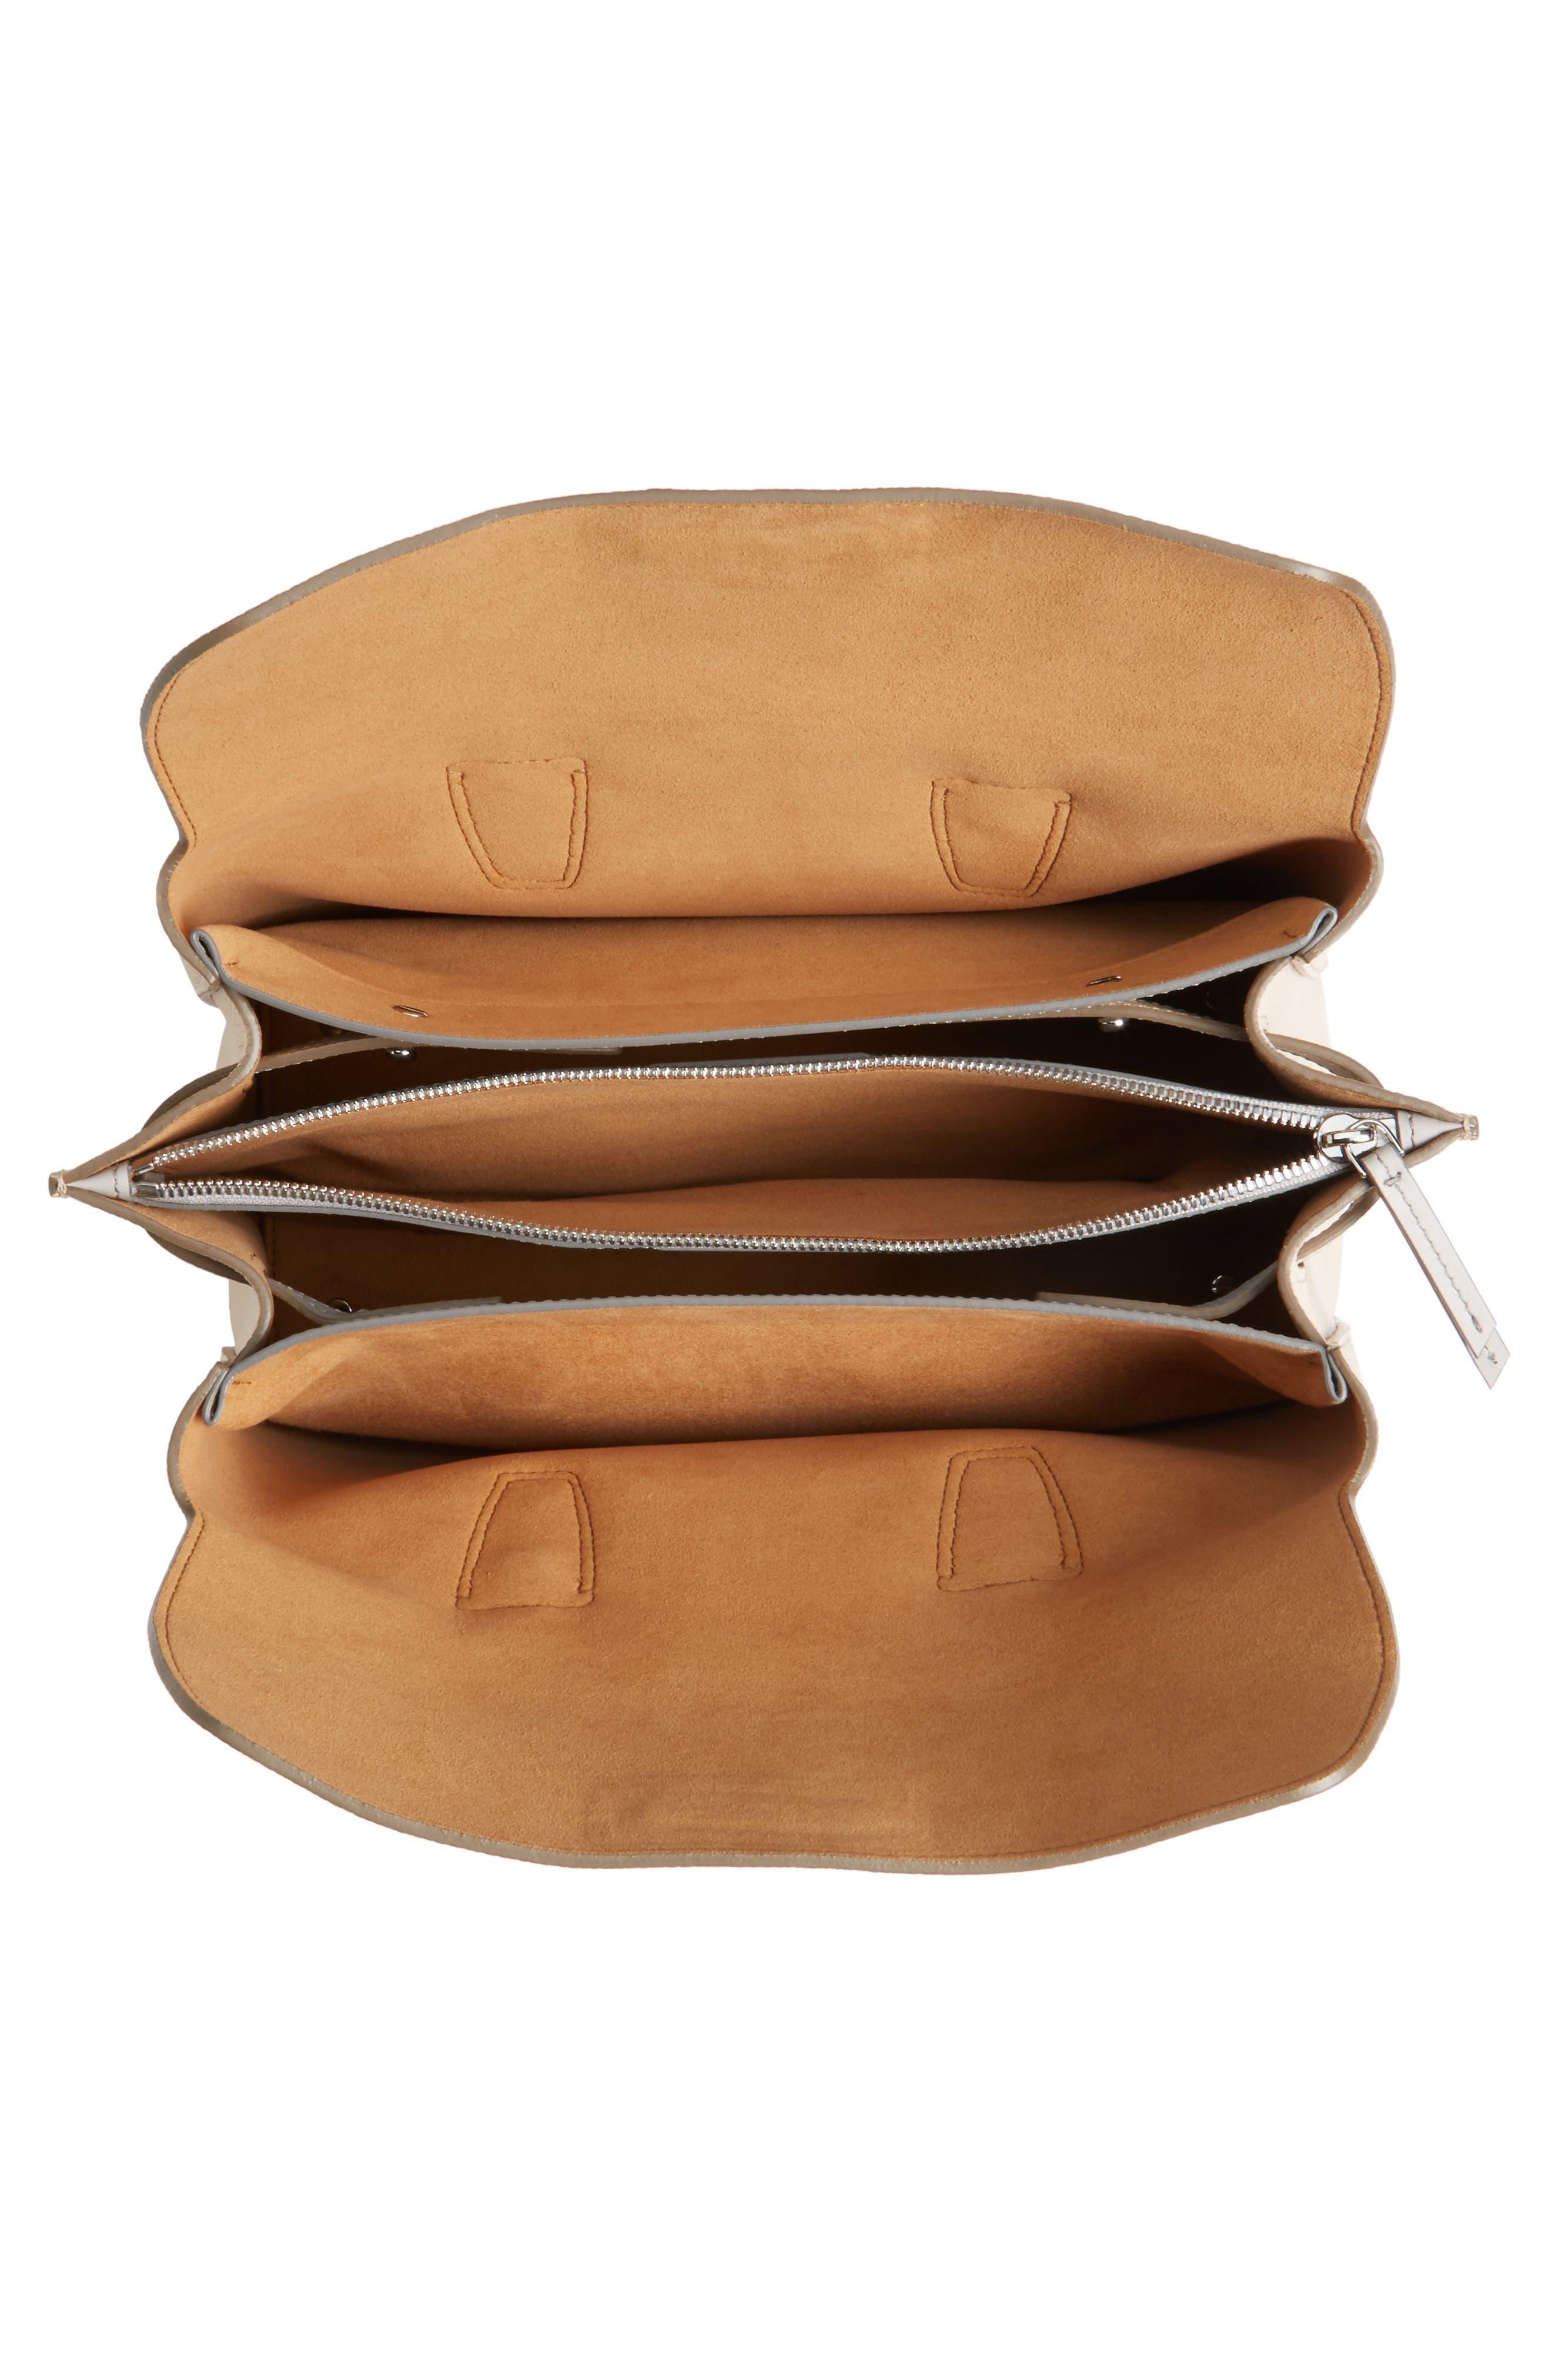 Medium Milla Leather Tote,                             Alternate thumbnail 4, color,                             Beige